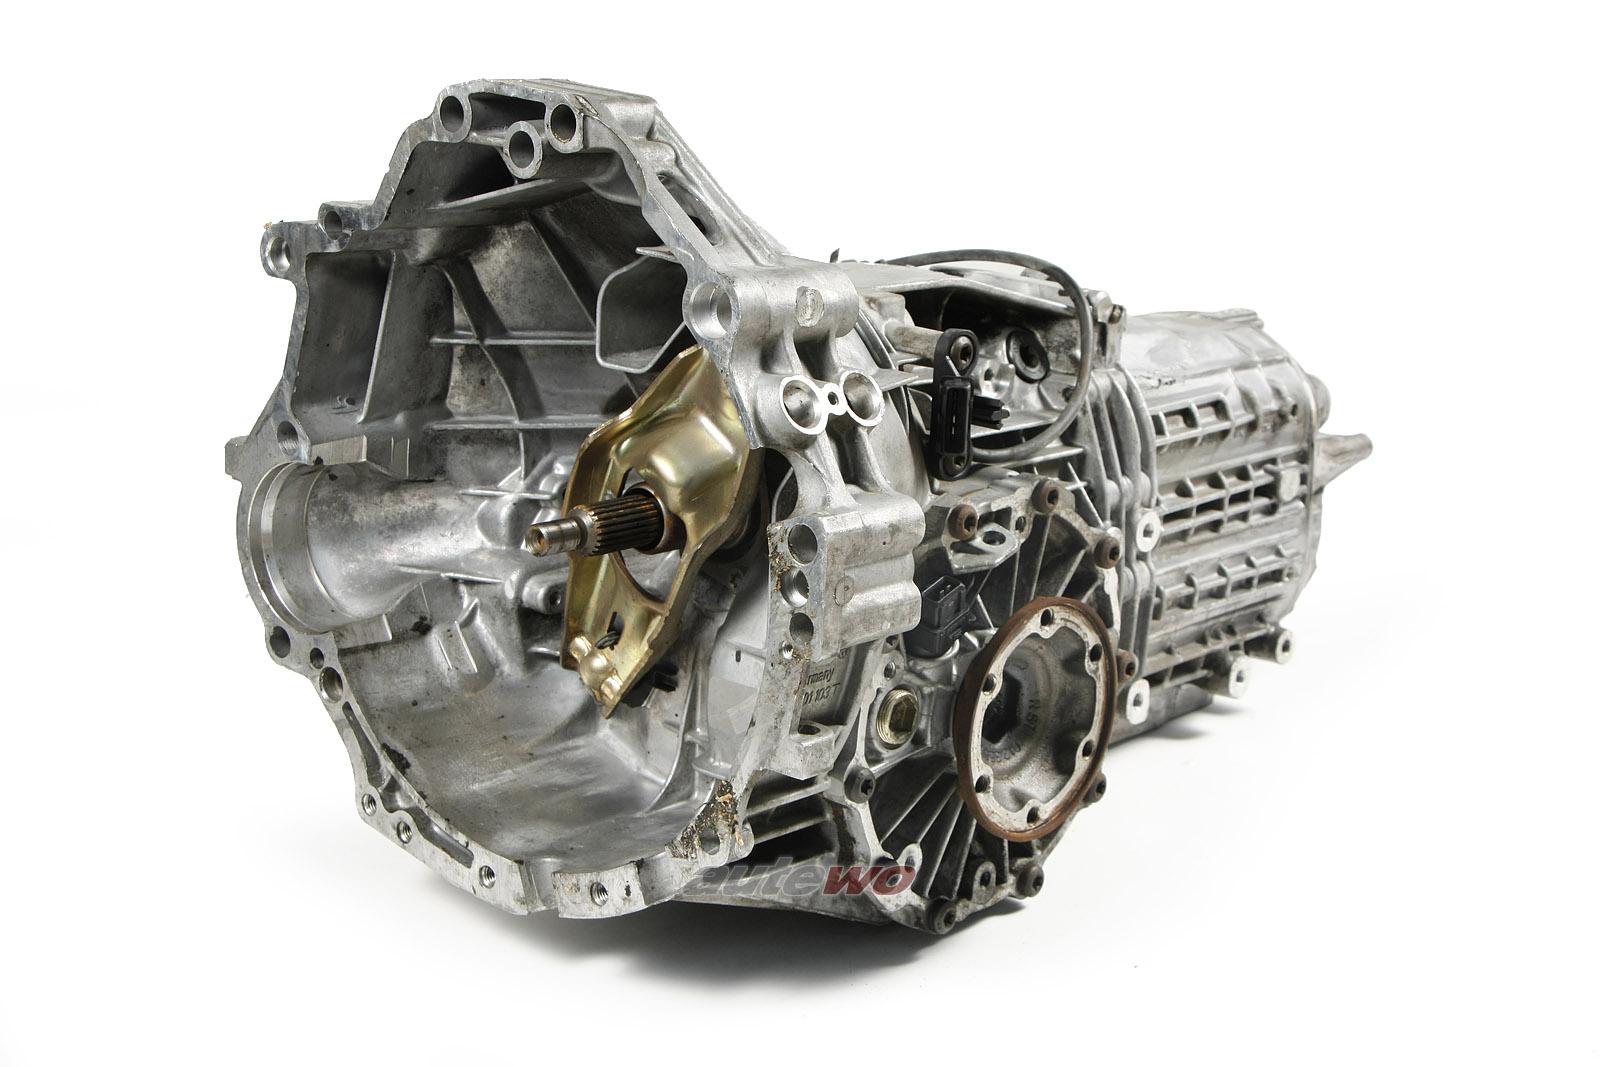 012300054KX Audi 80 Typ 89 Cabrio/A4 B5/A6 4B 1.8l Getriebe 5-Gang DWA 16118